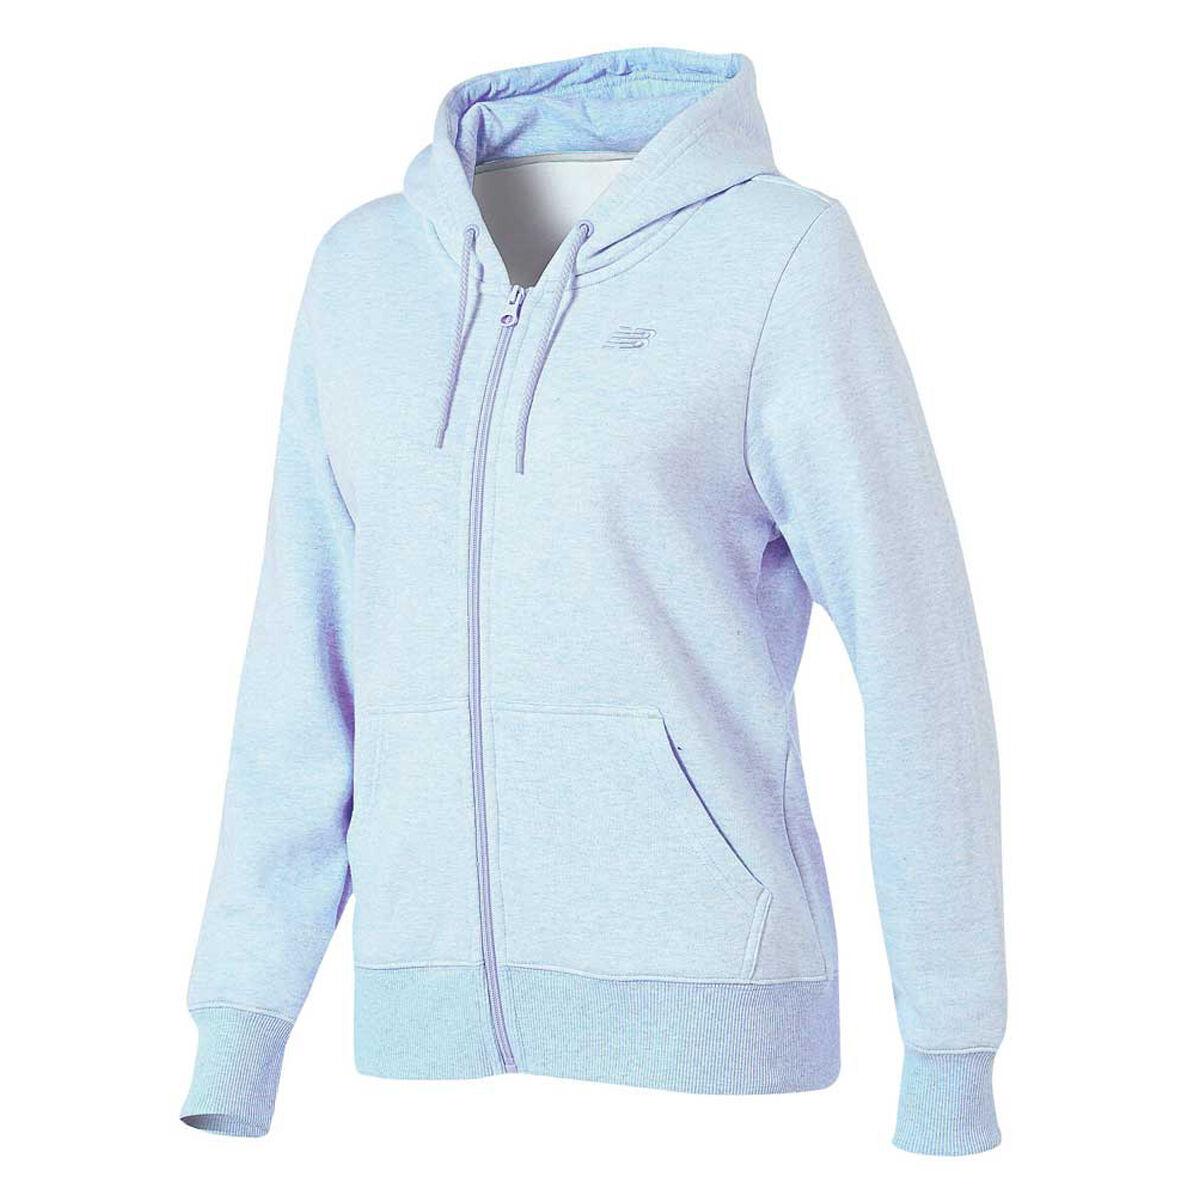 76b250c747e50 new balance full zip hoodie Sale,up to 31% Discounts